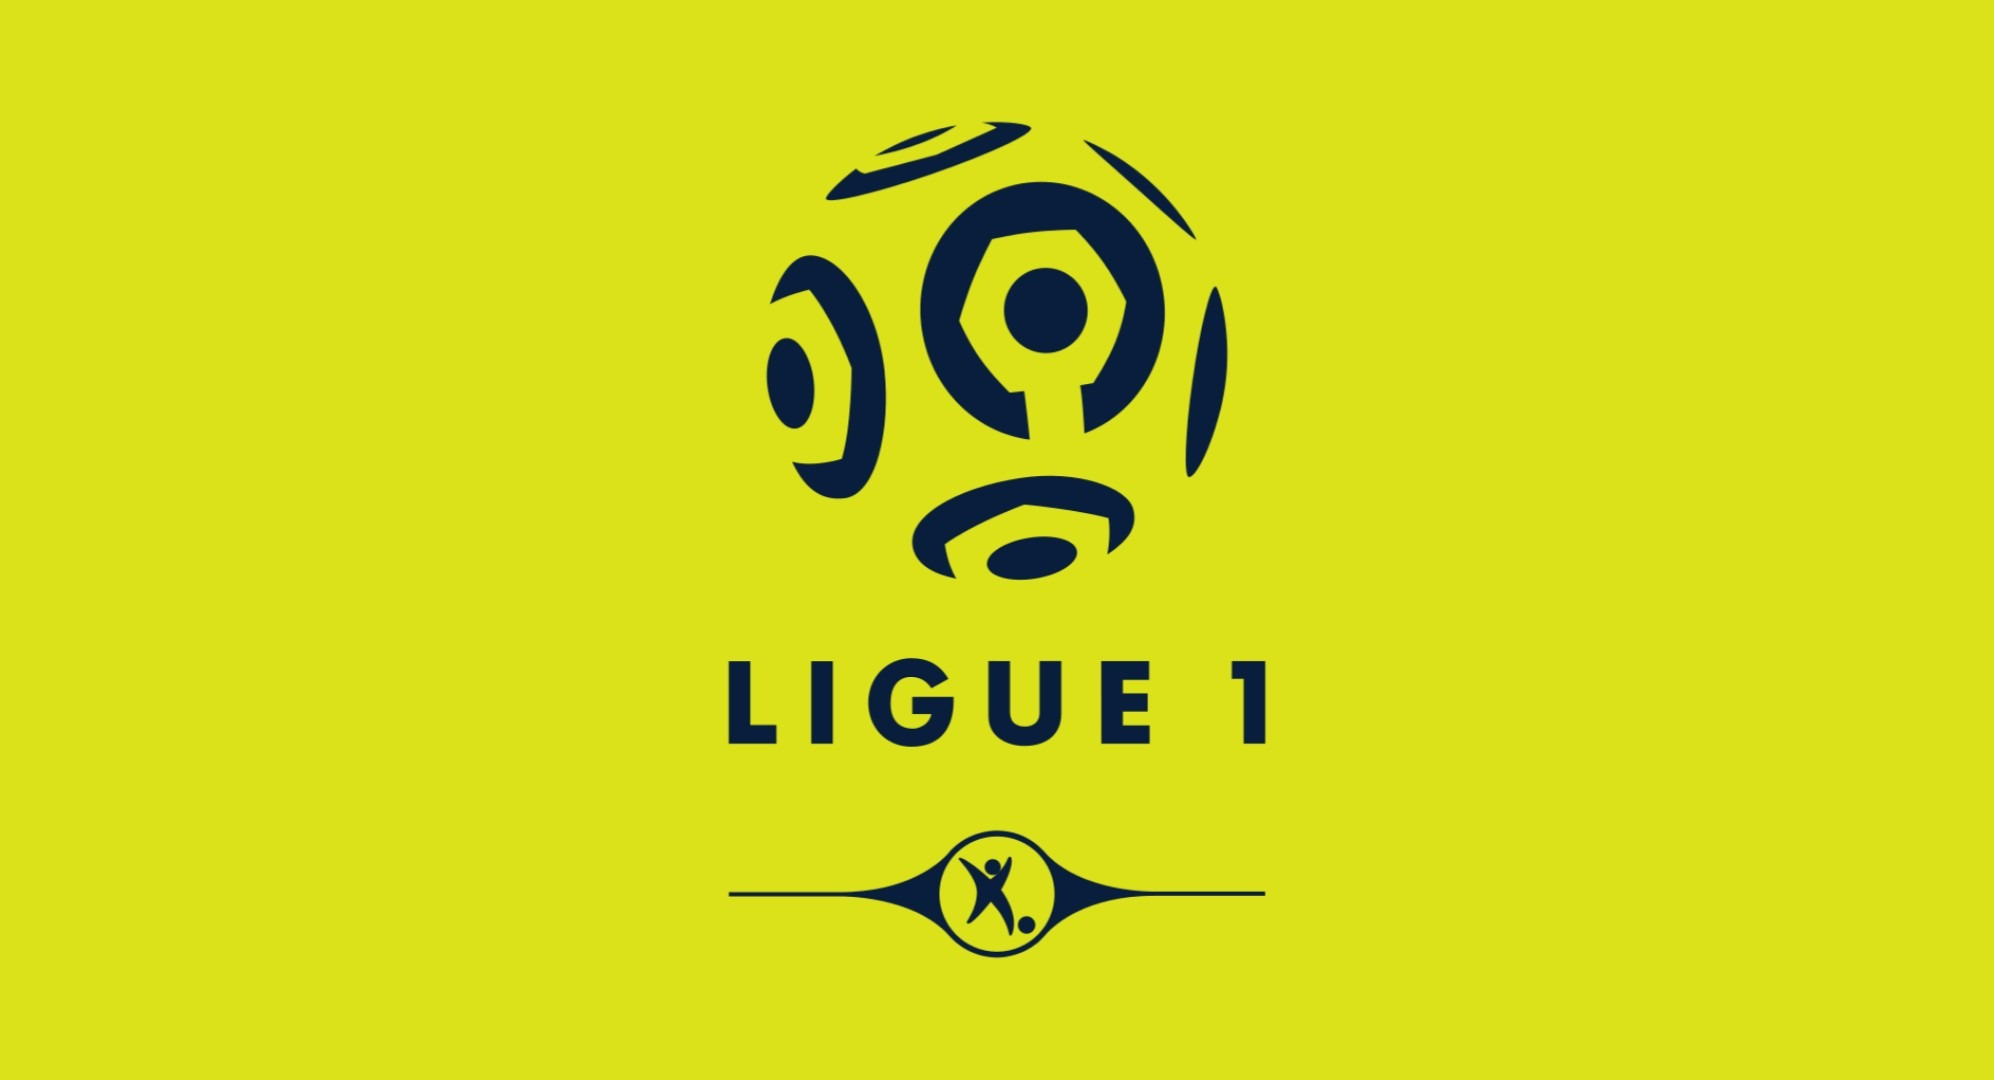 Lfp Ends 2019 20 Season Psg Named Ligue 1 Champions The Blog Cpd Football By Chris Punnakkattu Daniel